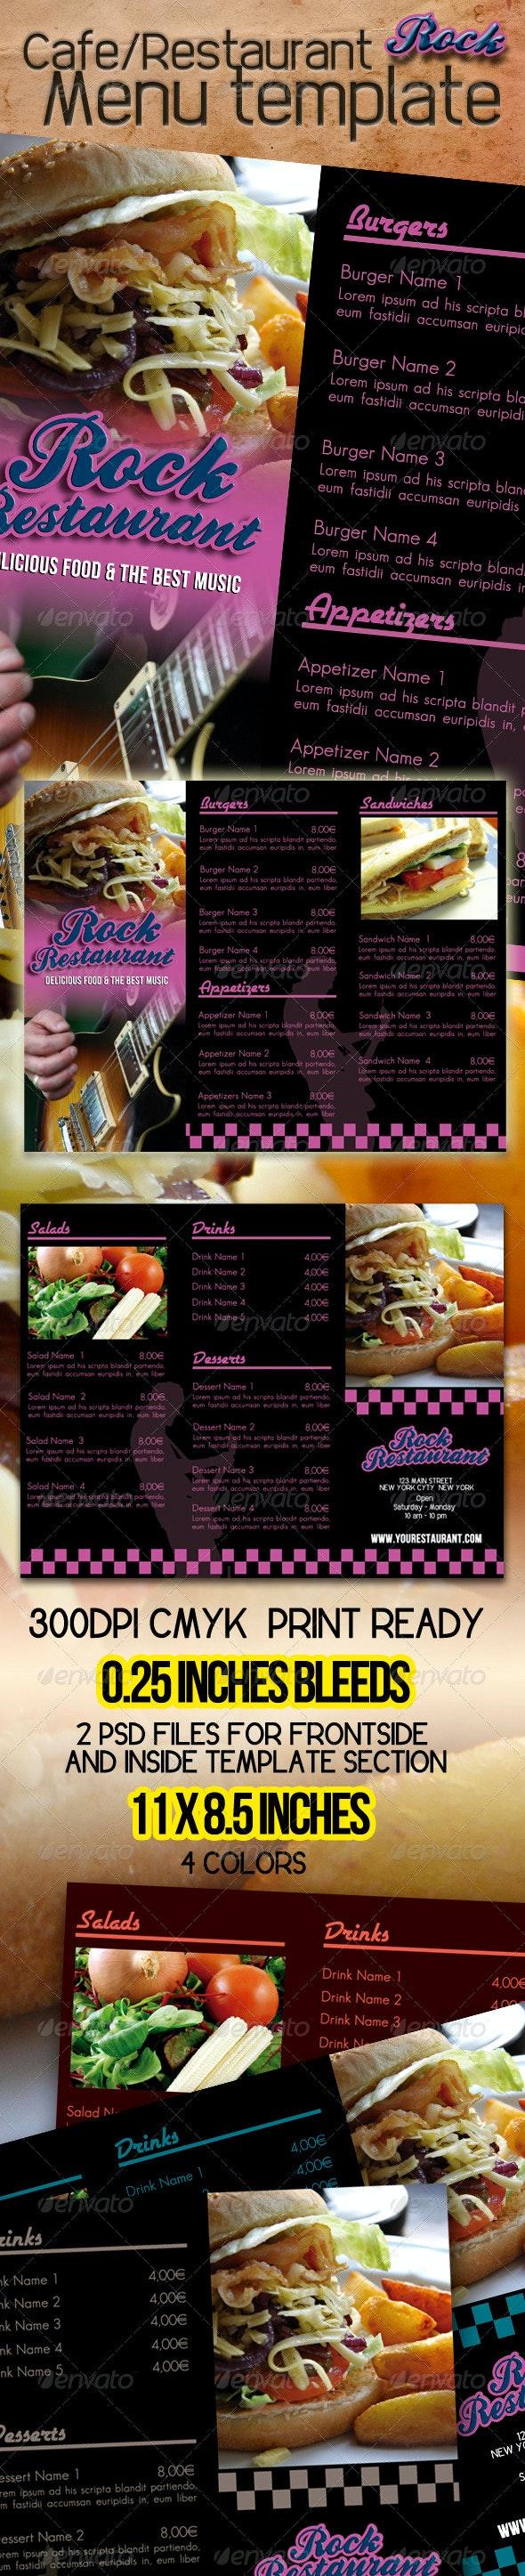 Rock Cafe Restaurant Menu Template - Food Menus Print Templates